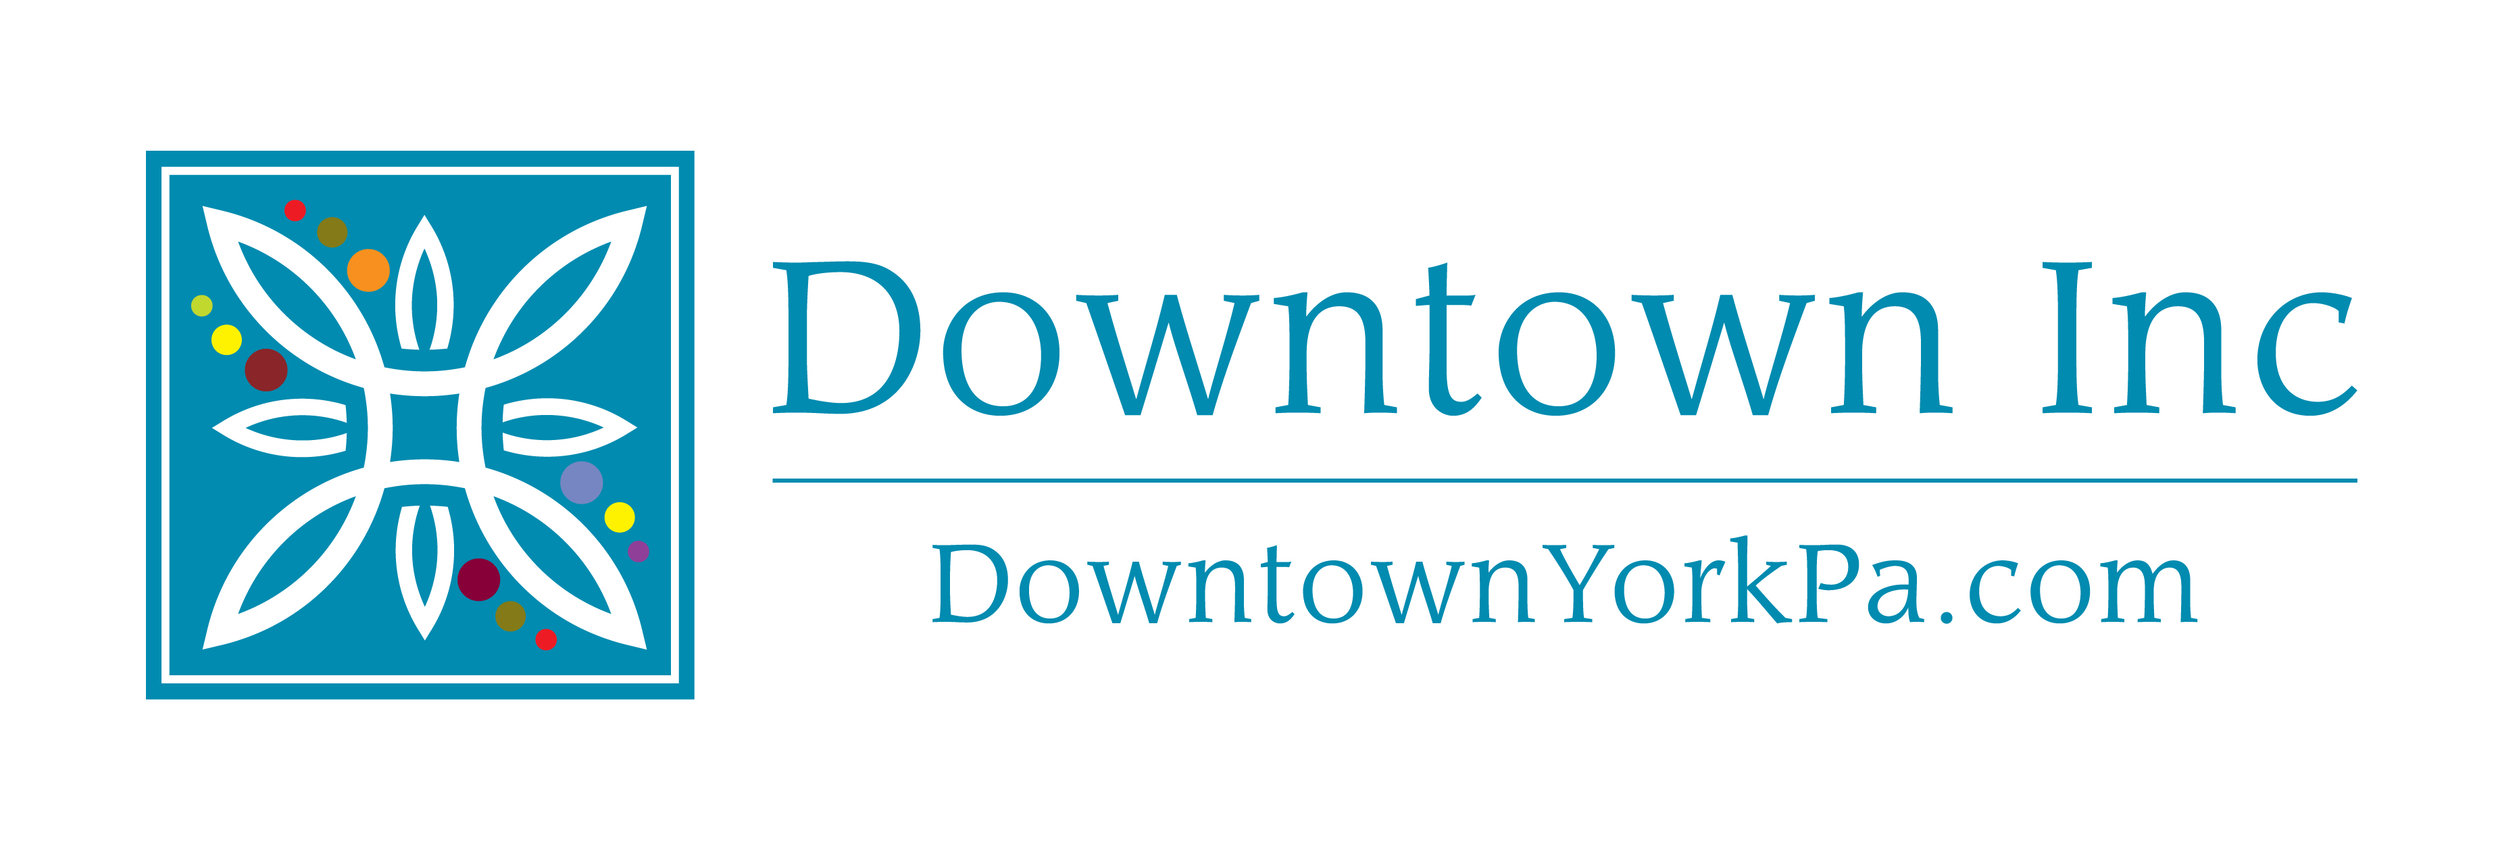 DowntownInc_URL, hi-res.jpg